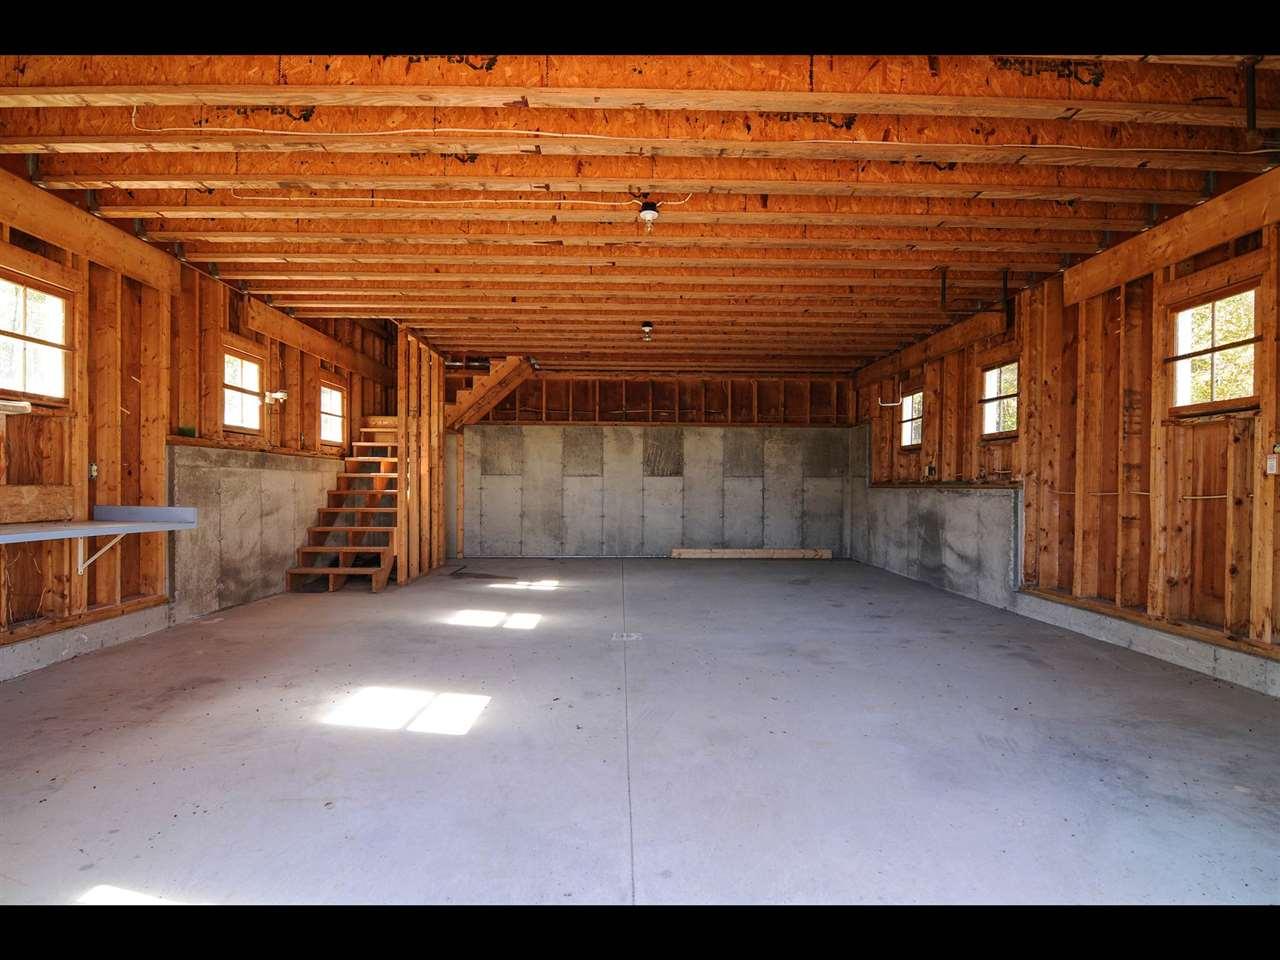 Barn interior 11319826